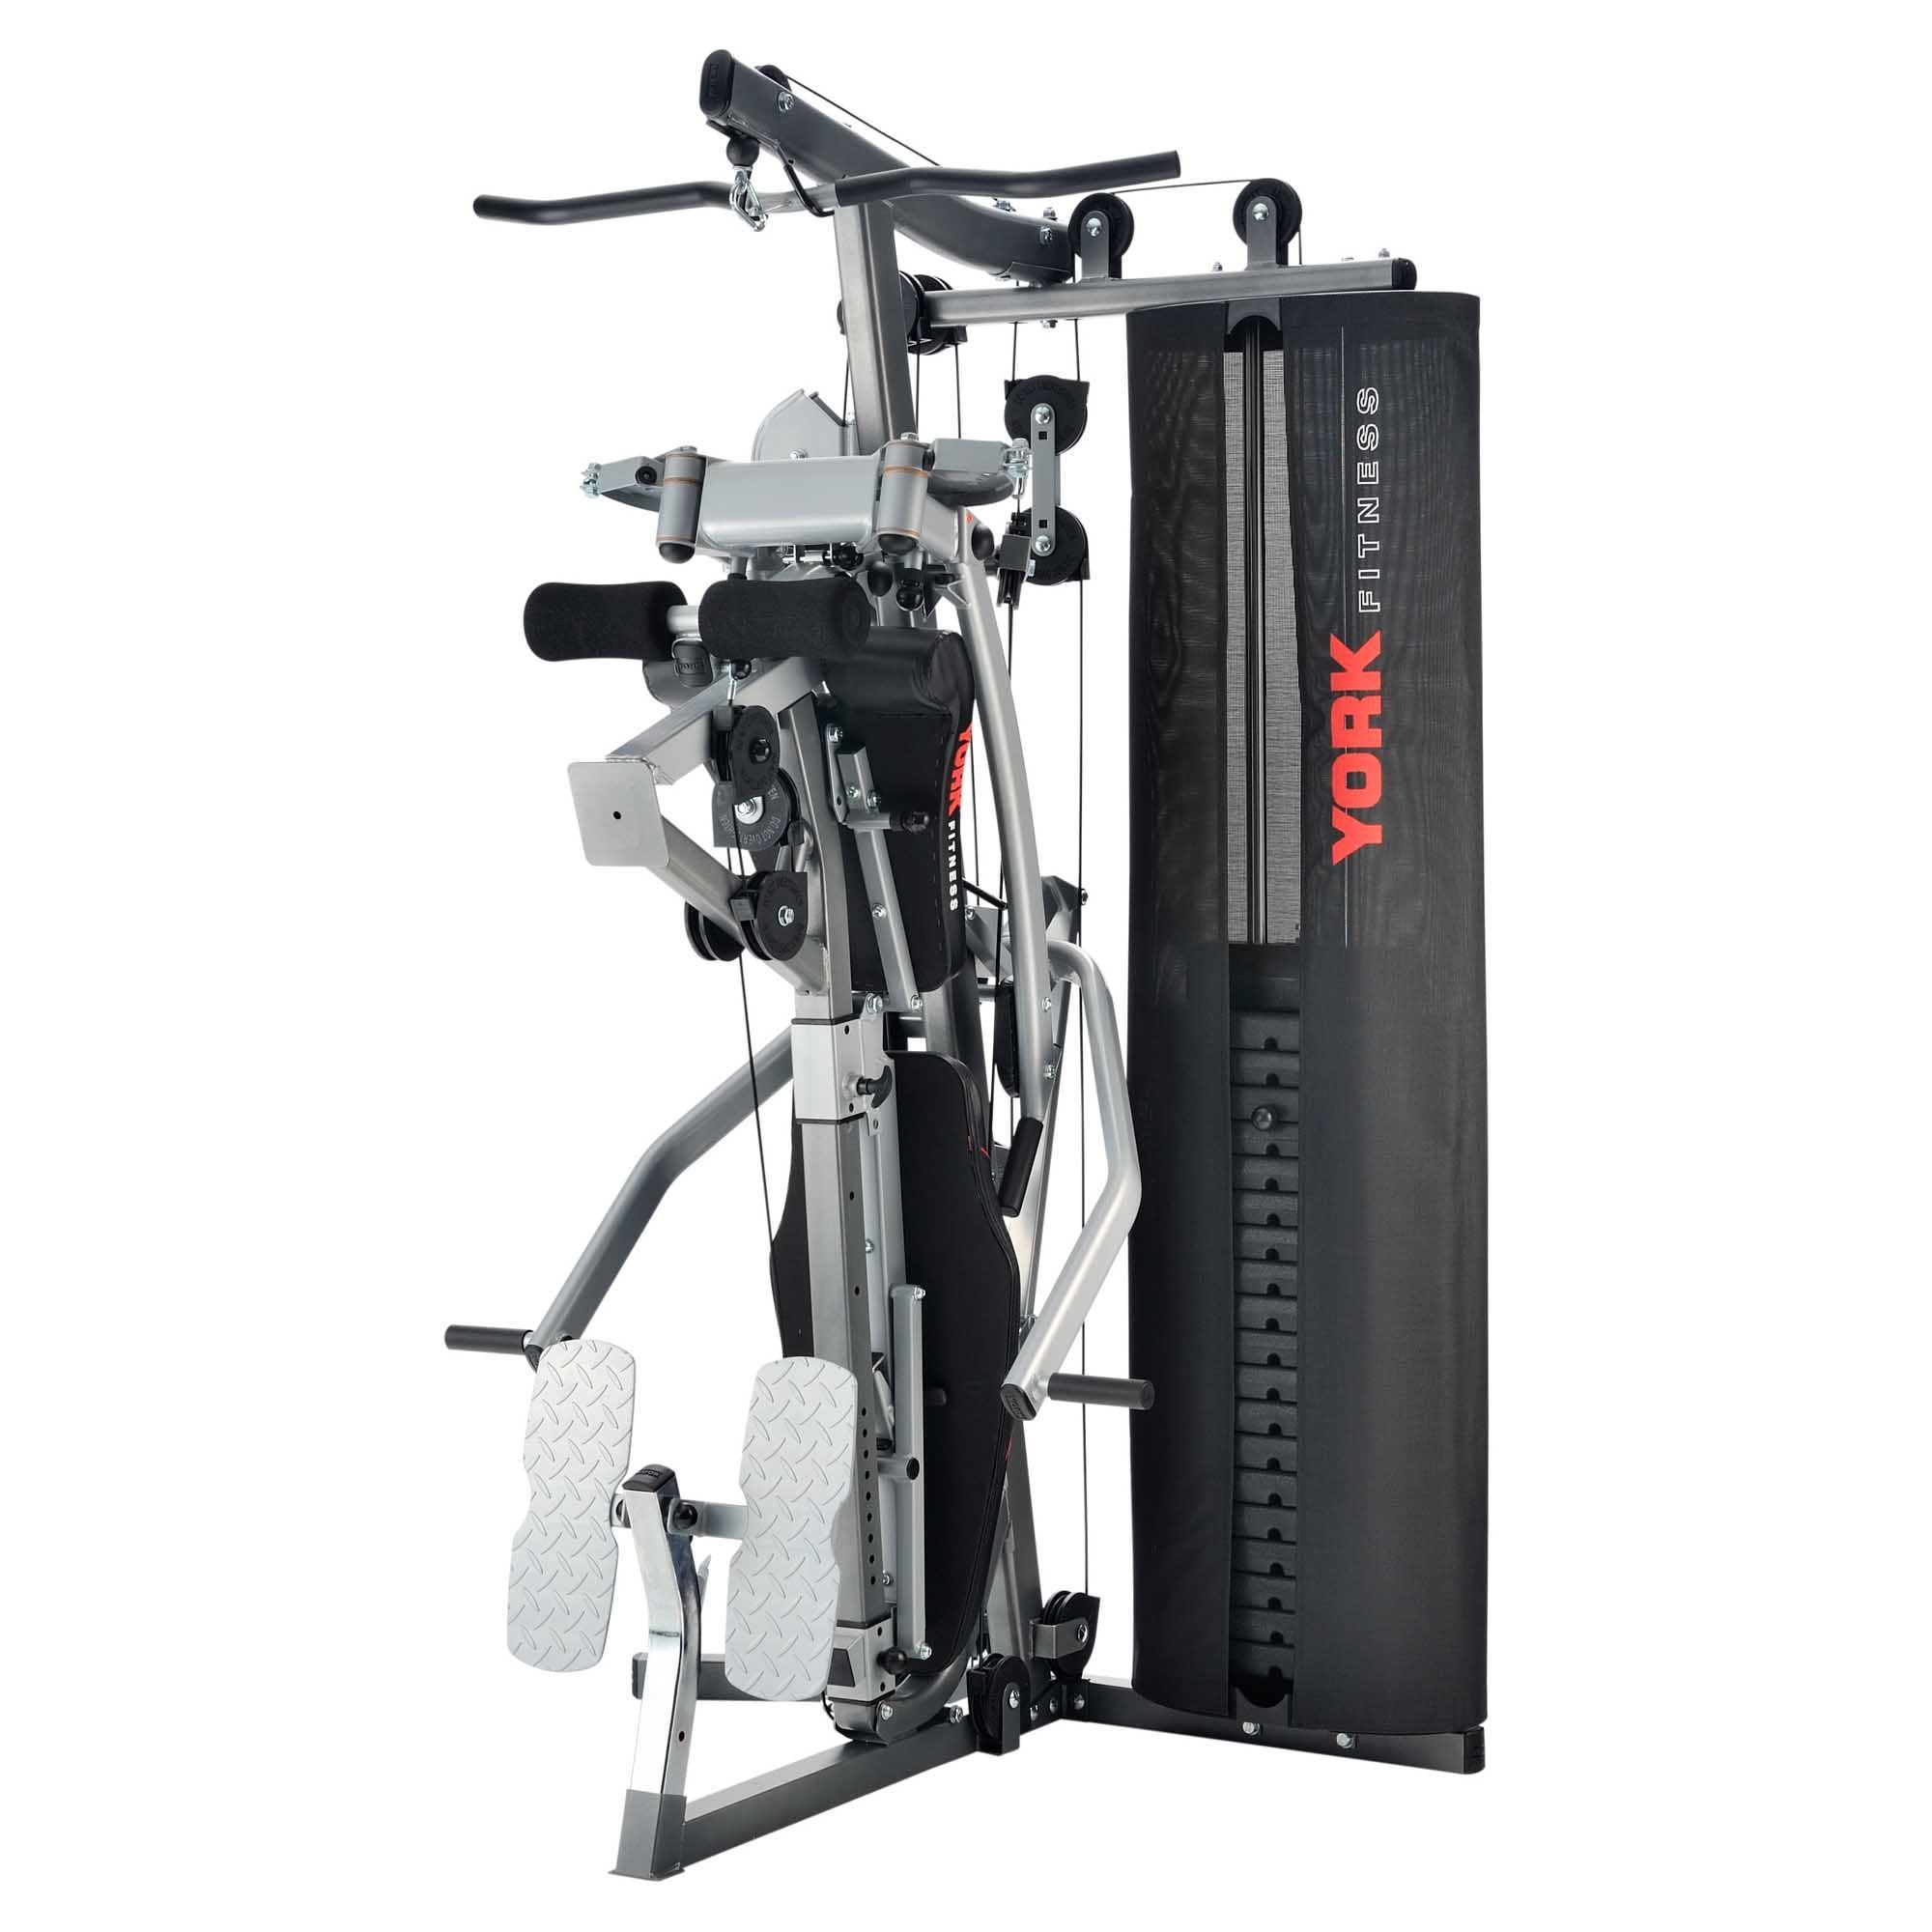 kettler multi gym user manual